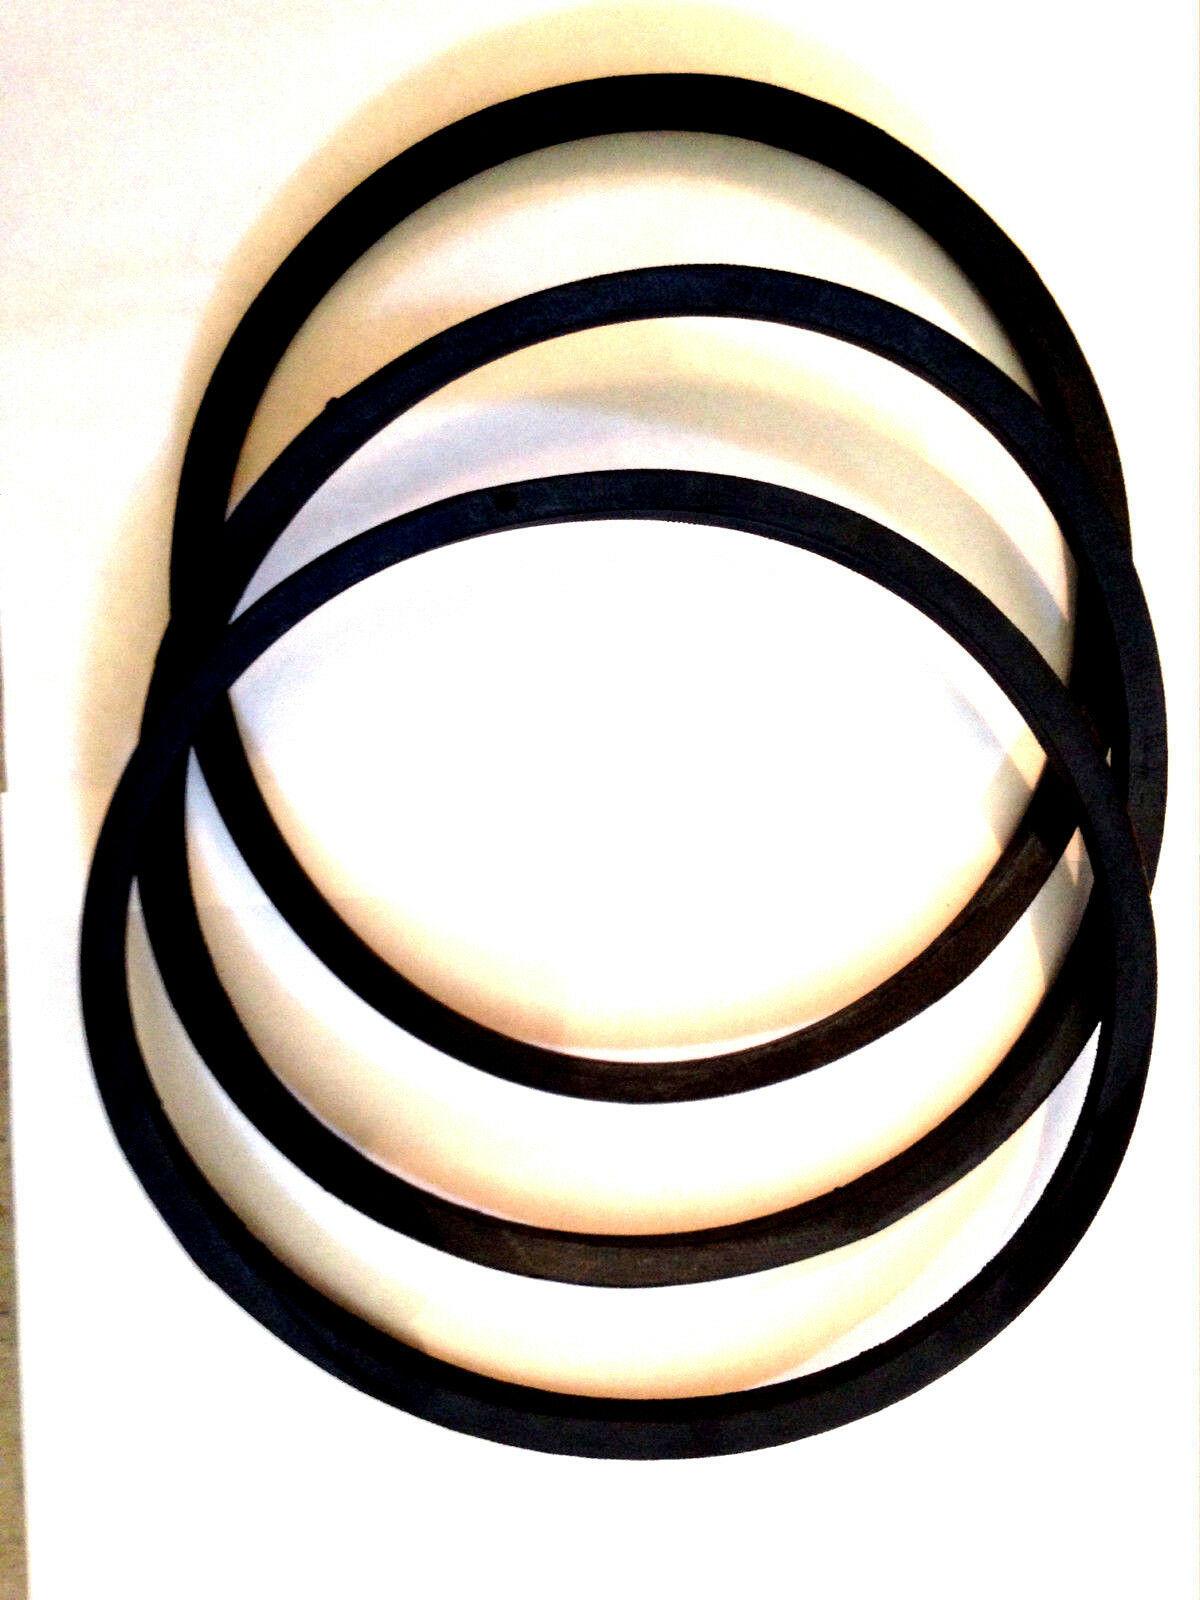 Nuovo 3 Ricambio Cintura Set Delta Rockwell Unisaw 30-8898 1HP 1725 Rpm